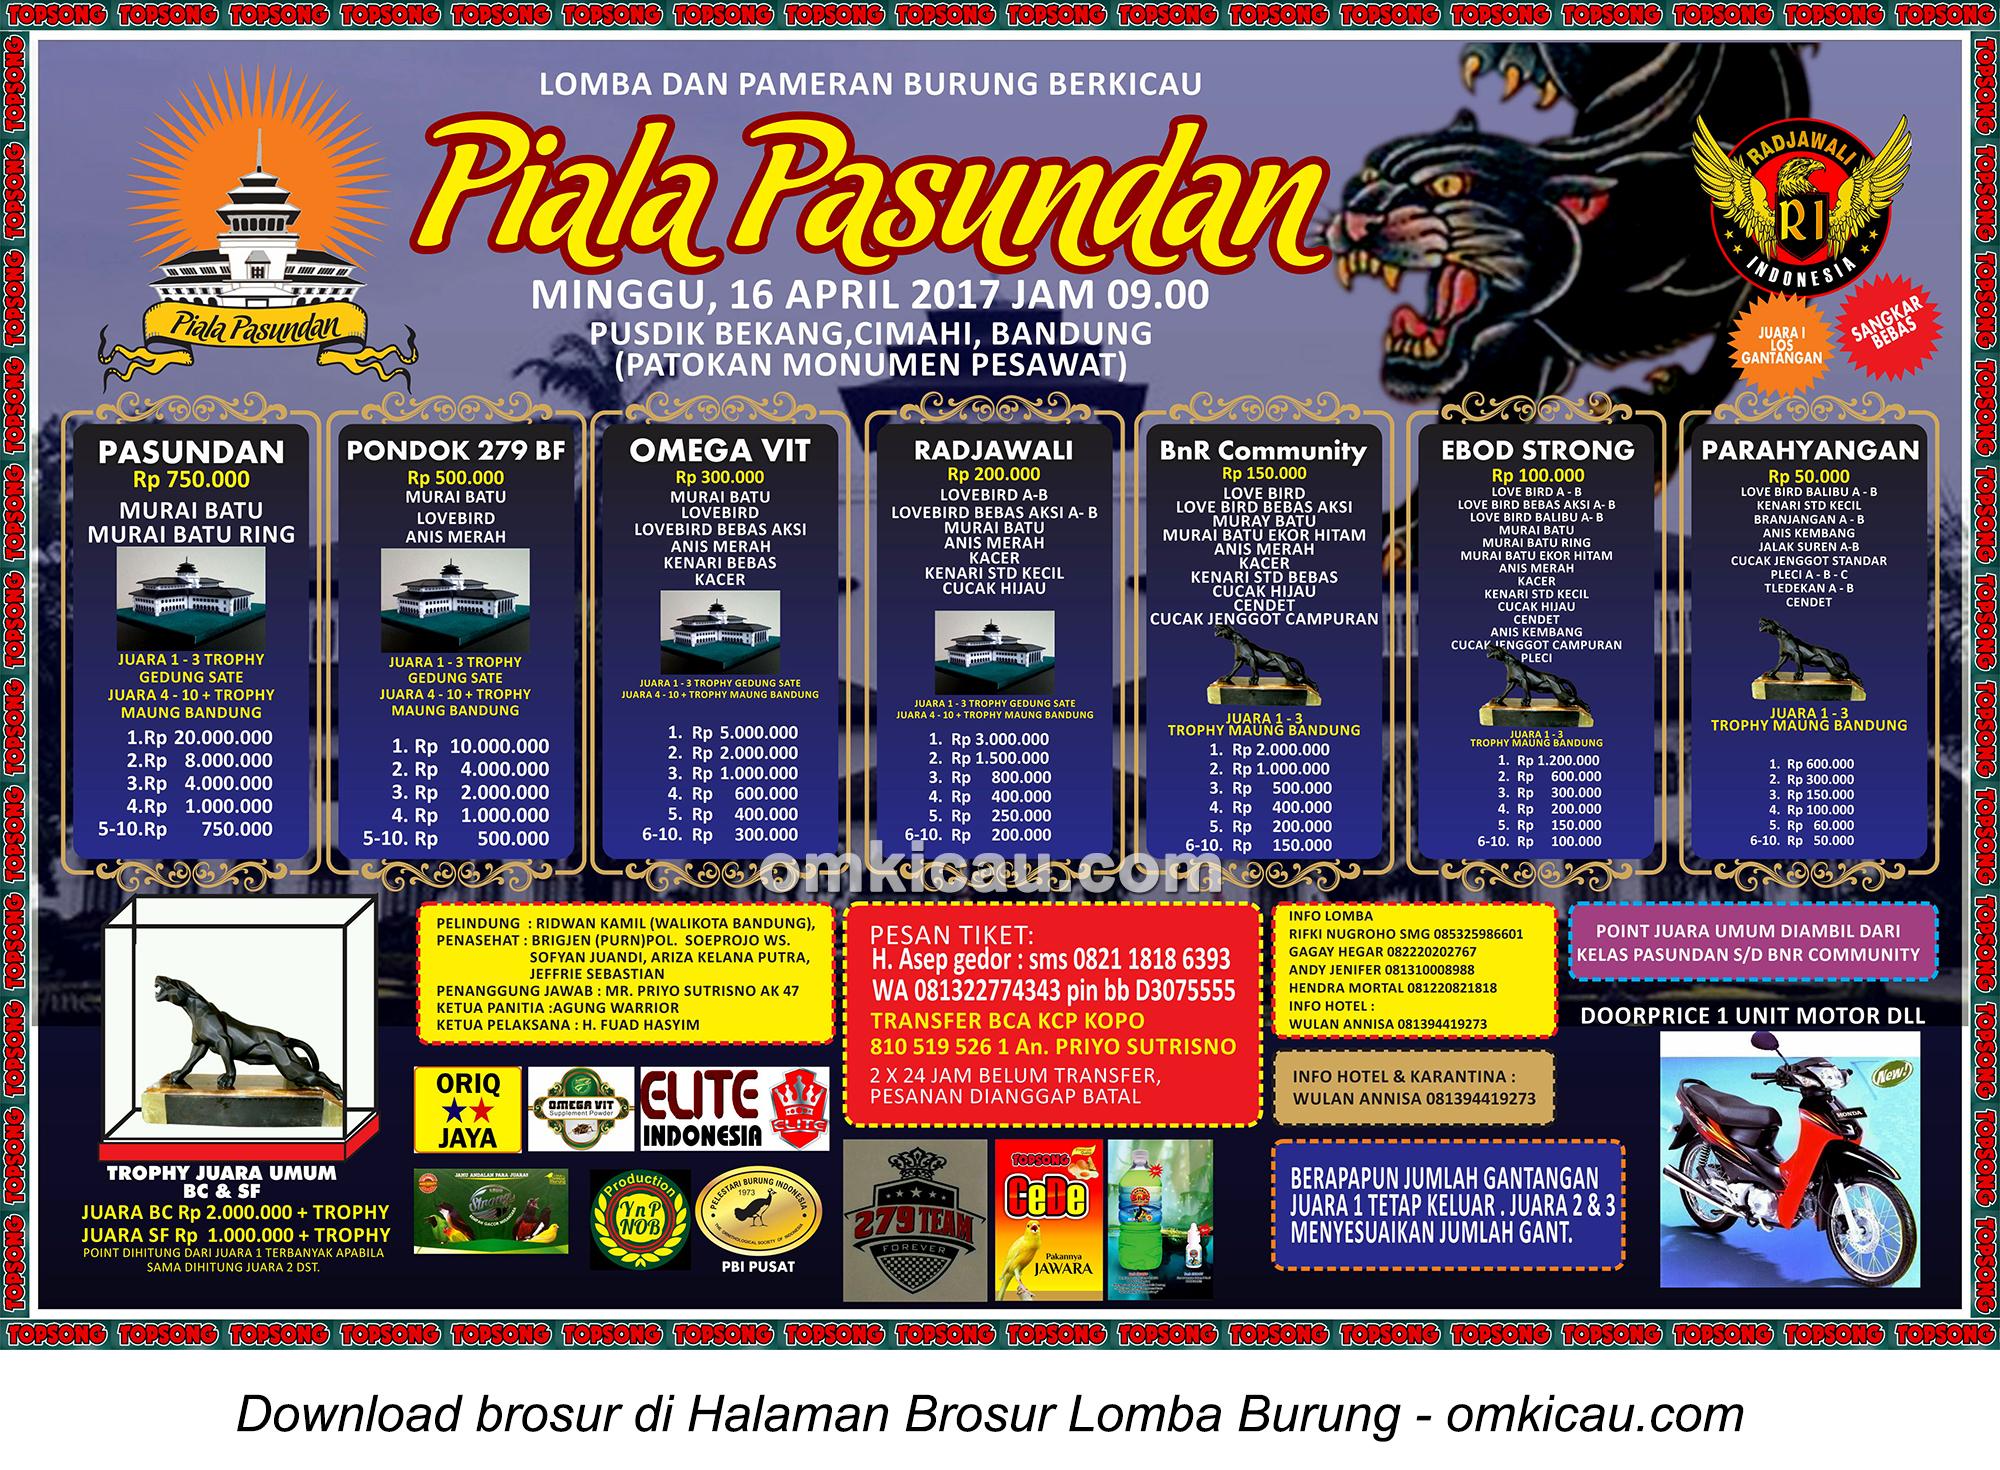 Brosur Lomba Burung Berkicau Piala Pasundan, Bandung, 16 April 2017